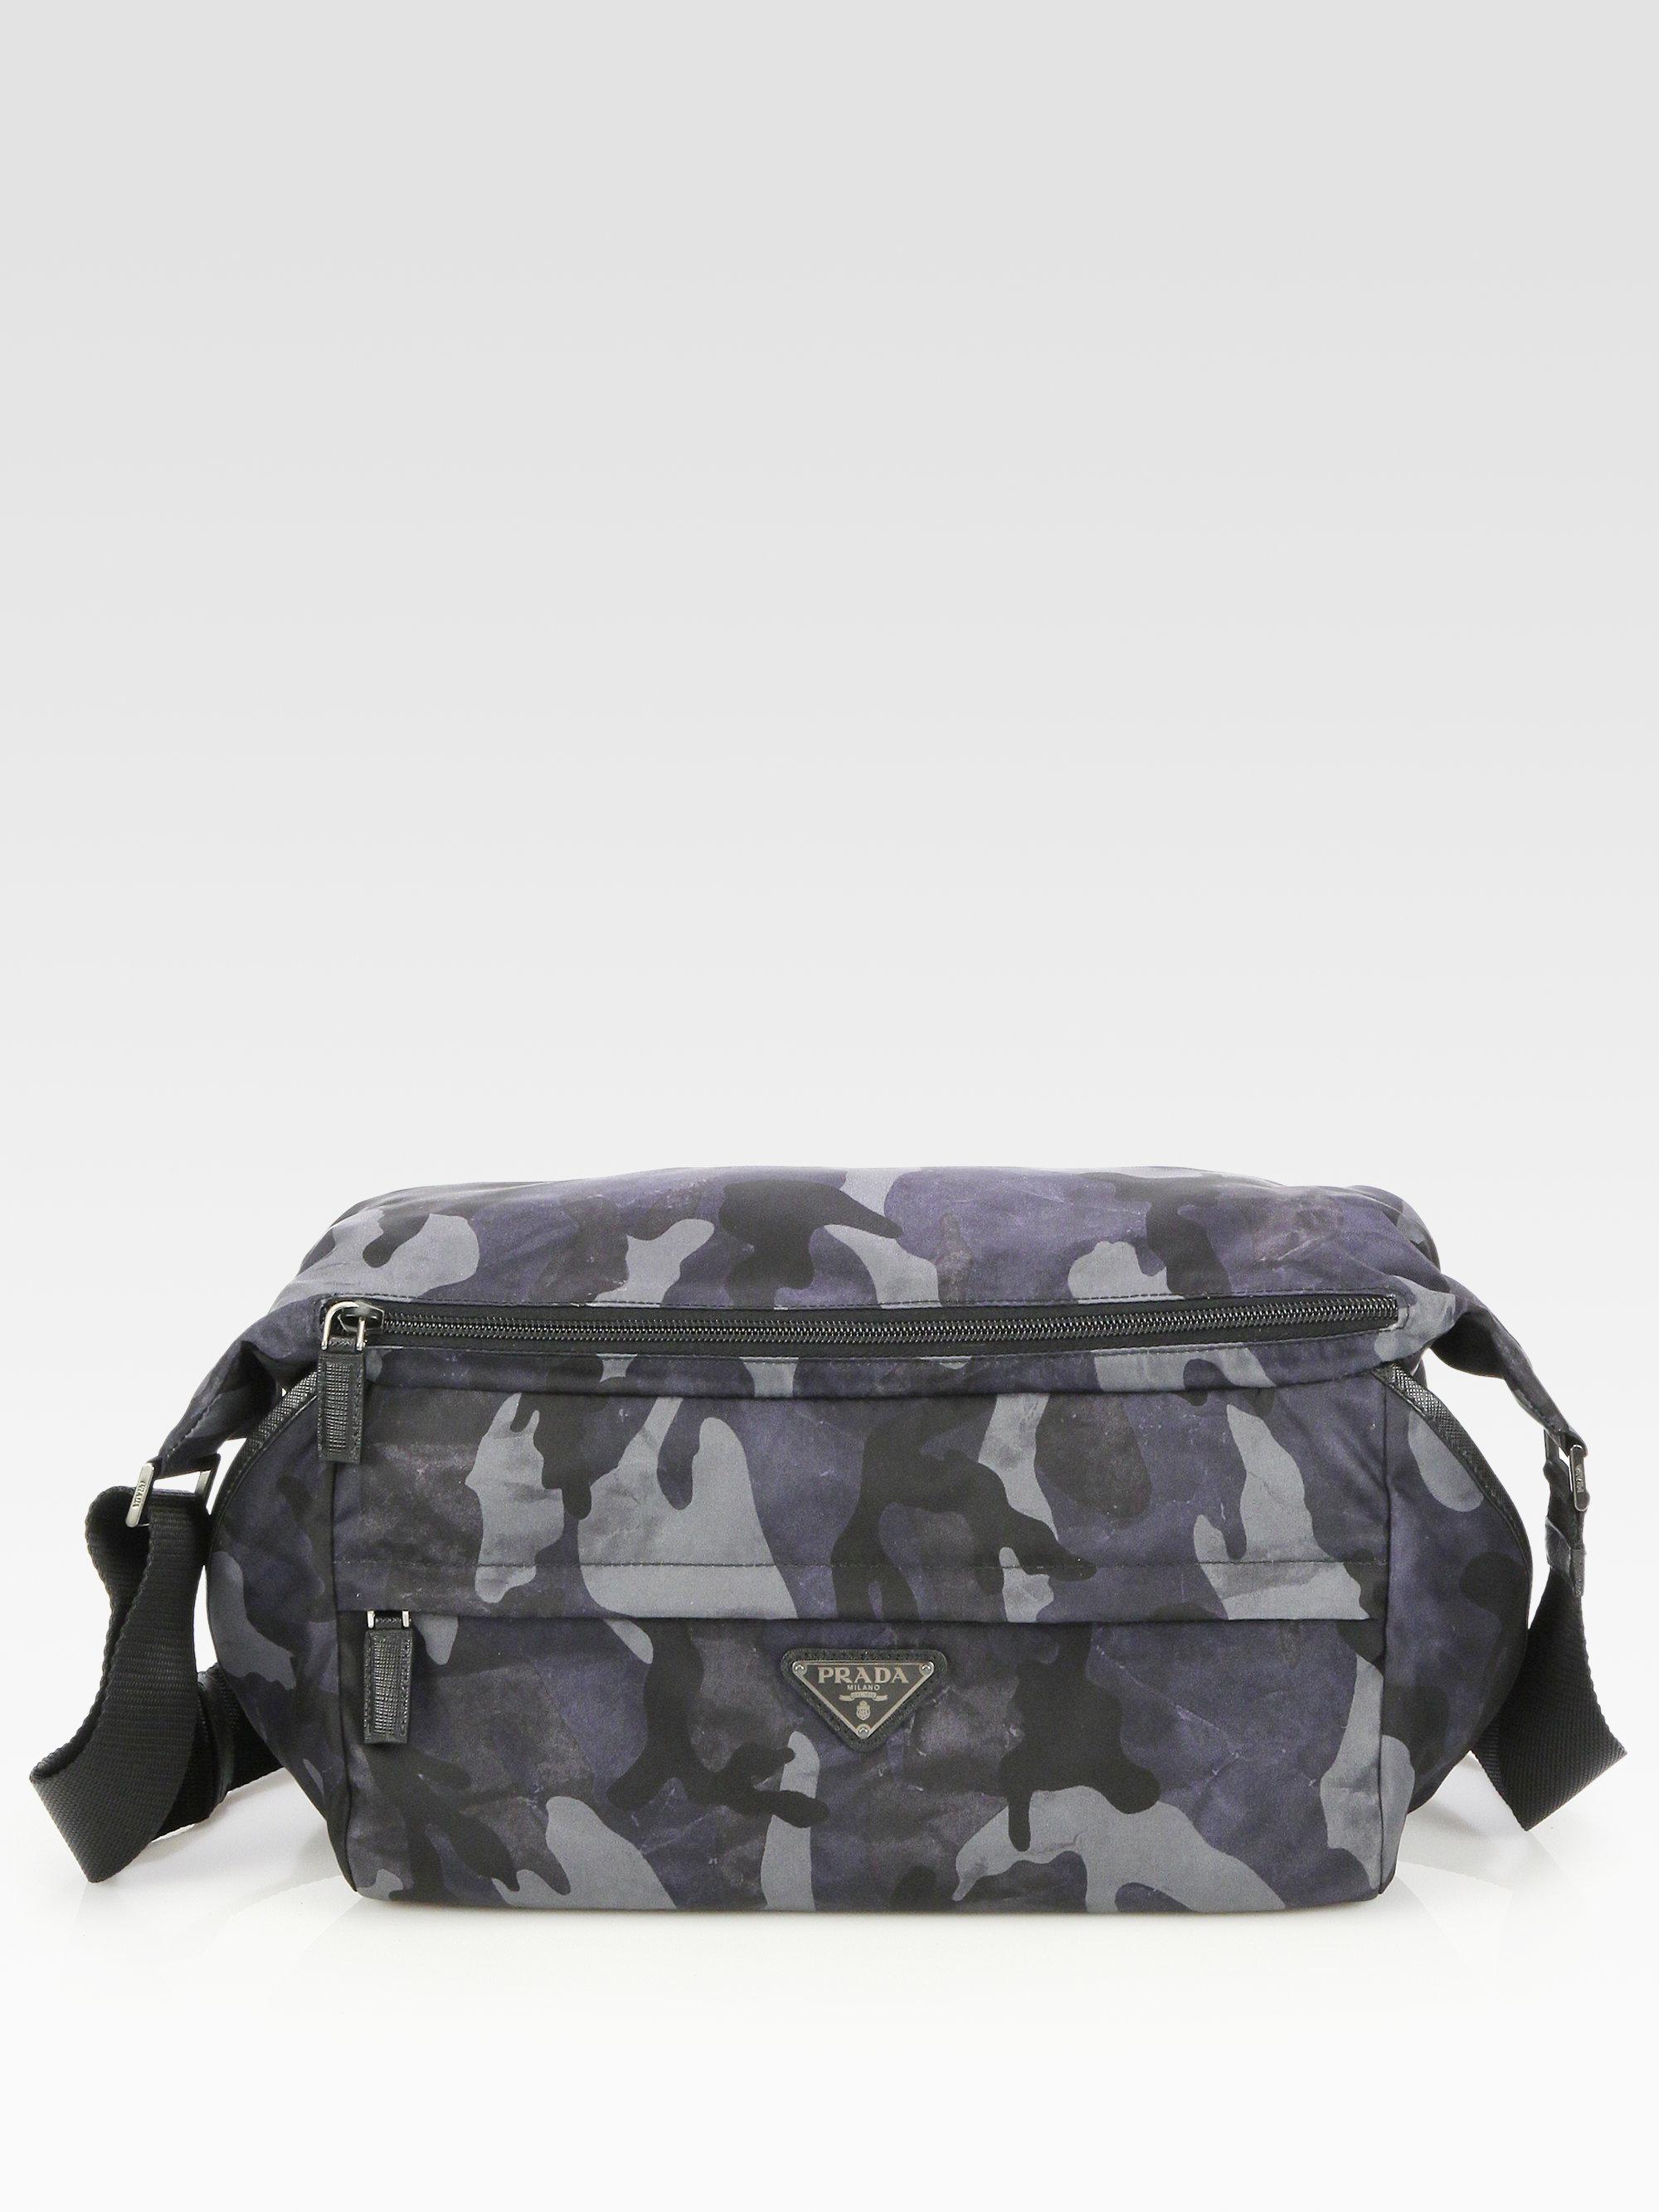 ... usa lyst prada small nylon shoulder bag in blue for men c85ee 70b40 0f31999bb6da2